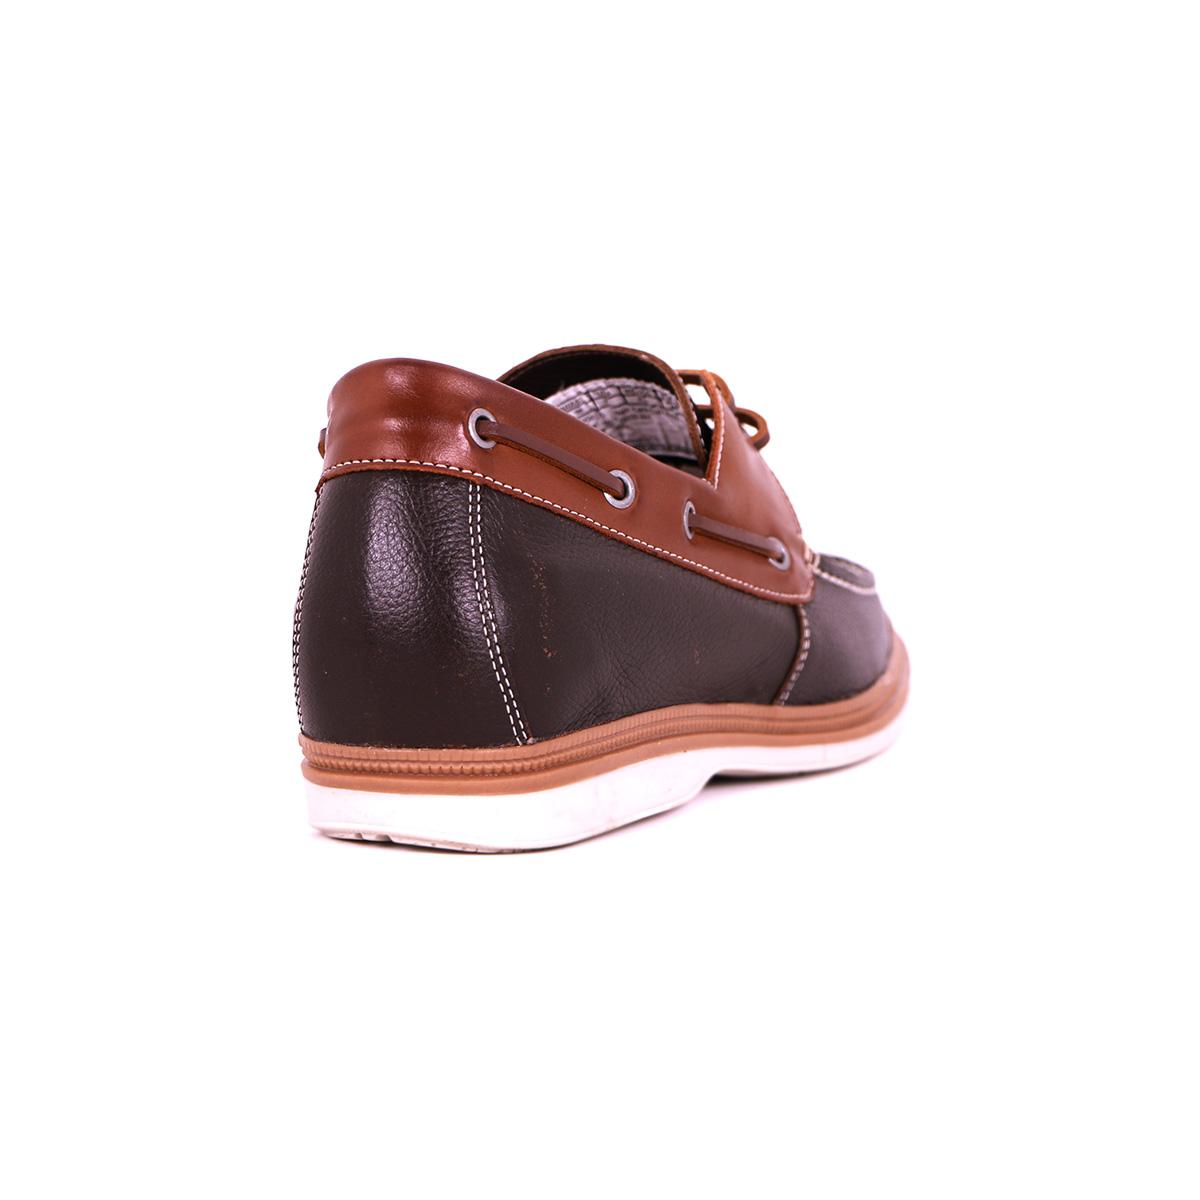 Zapato Casual Walk Café/Café Max Denegri +7cms de Altura_73411